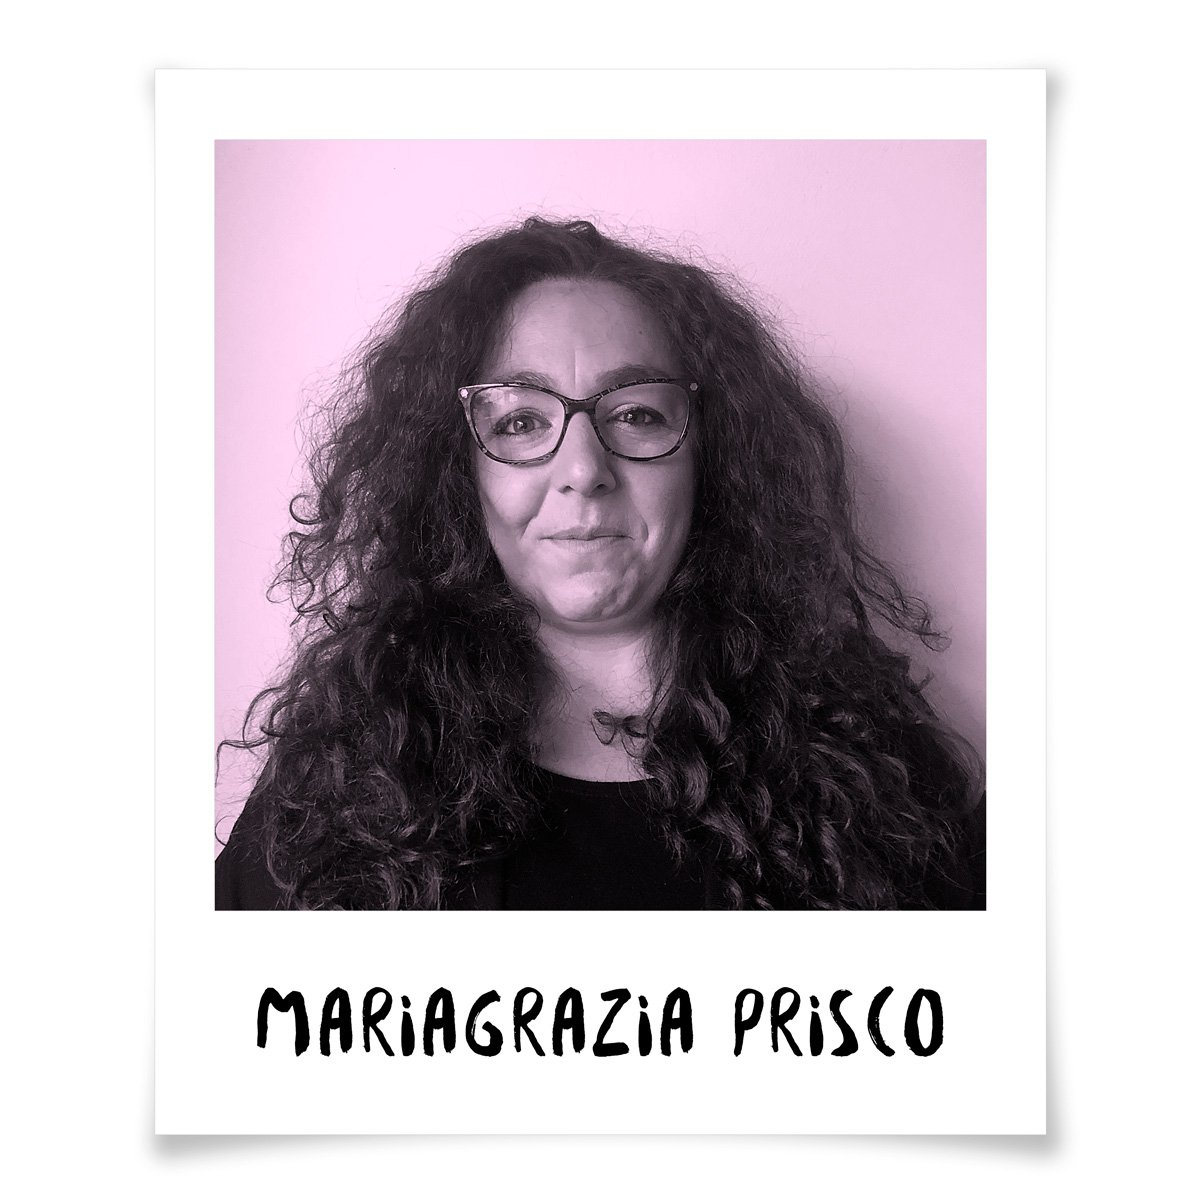 Mariagrazia_Prisco_ok